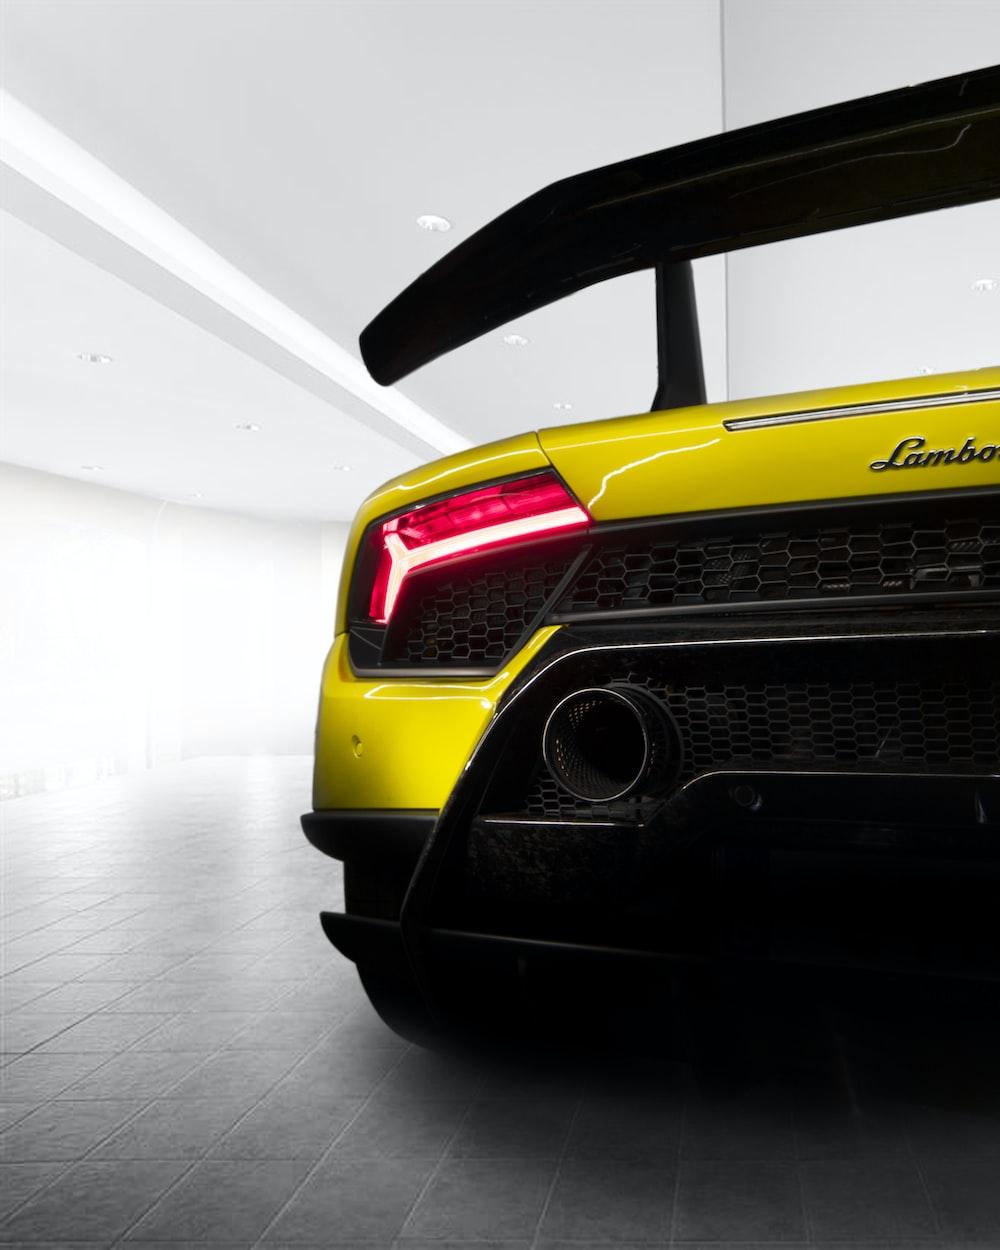 yellow and black Lamborghini vehicle screenshot